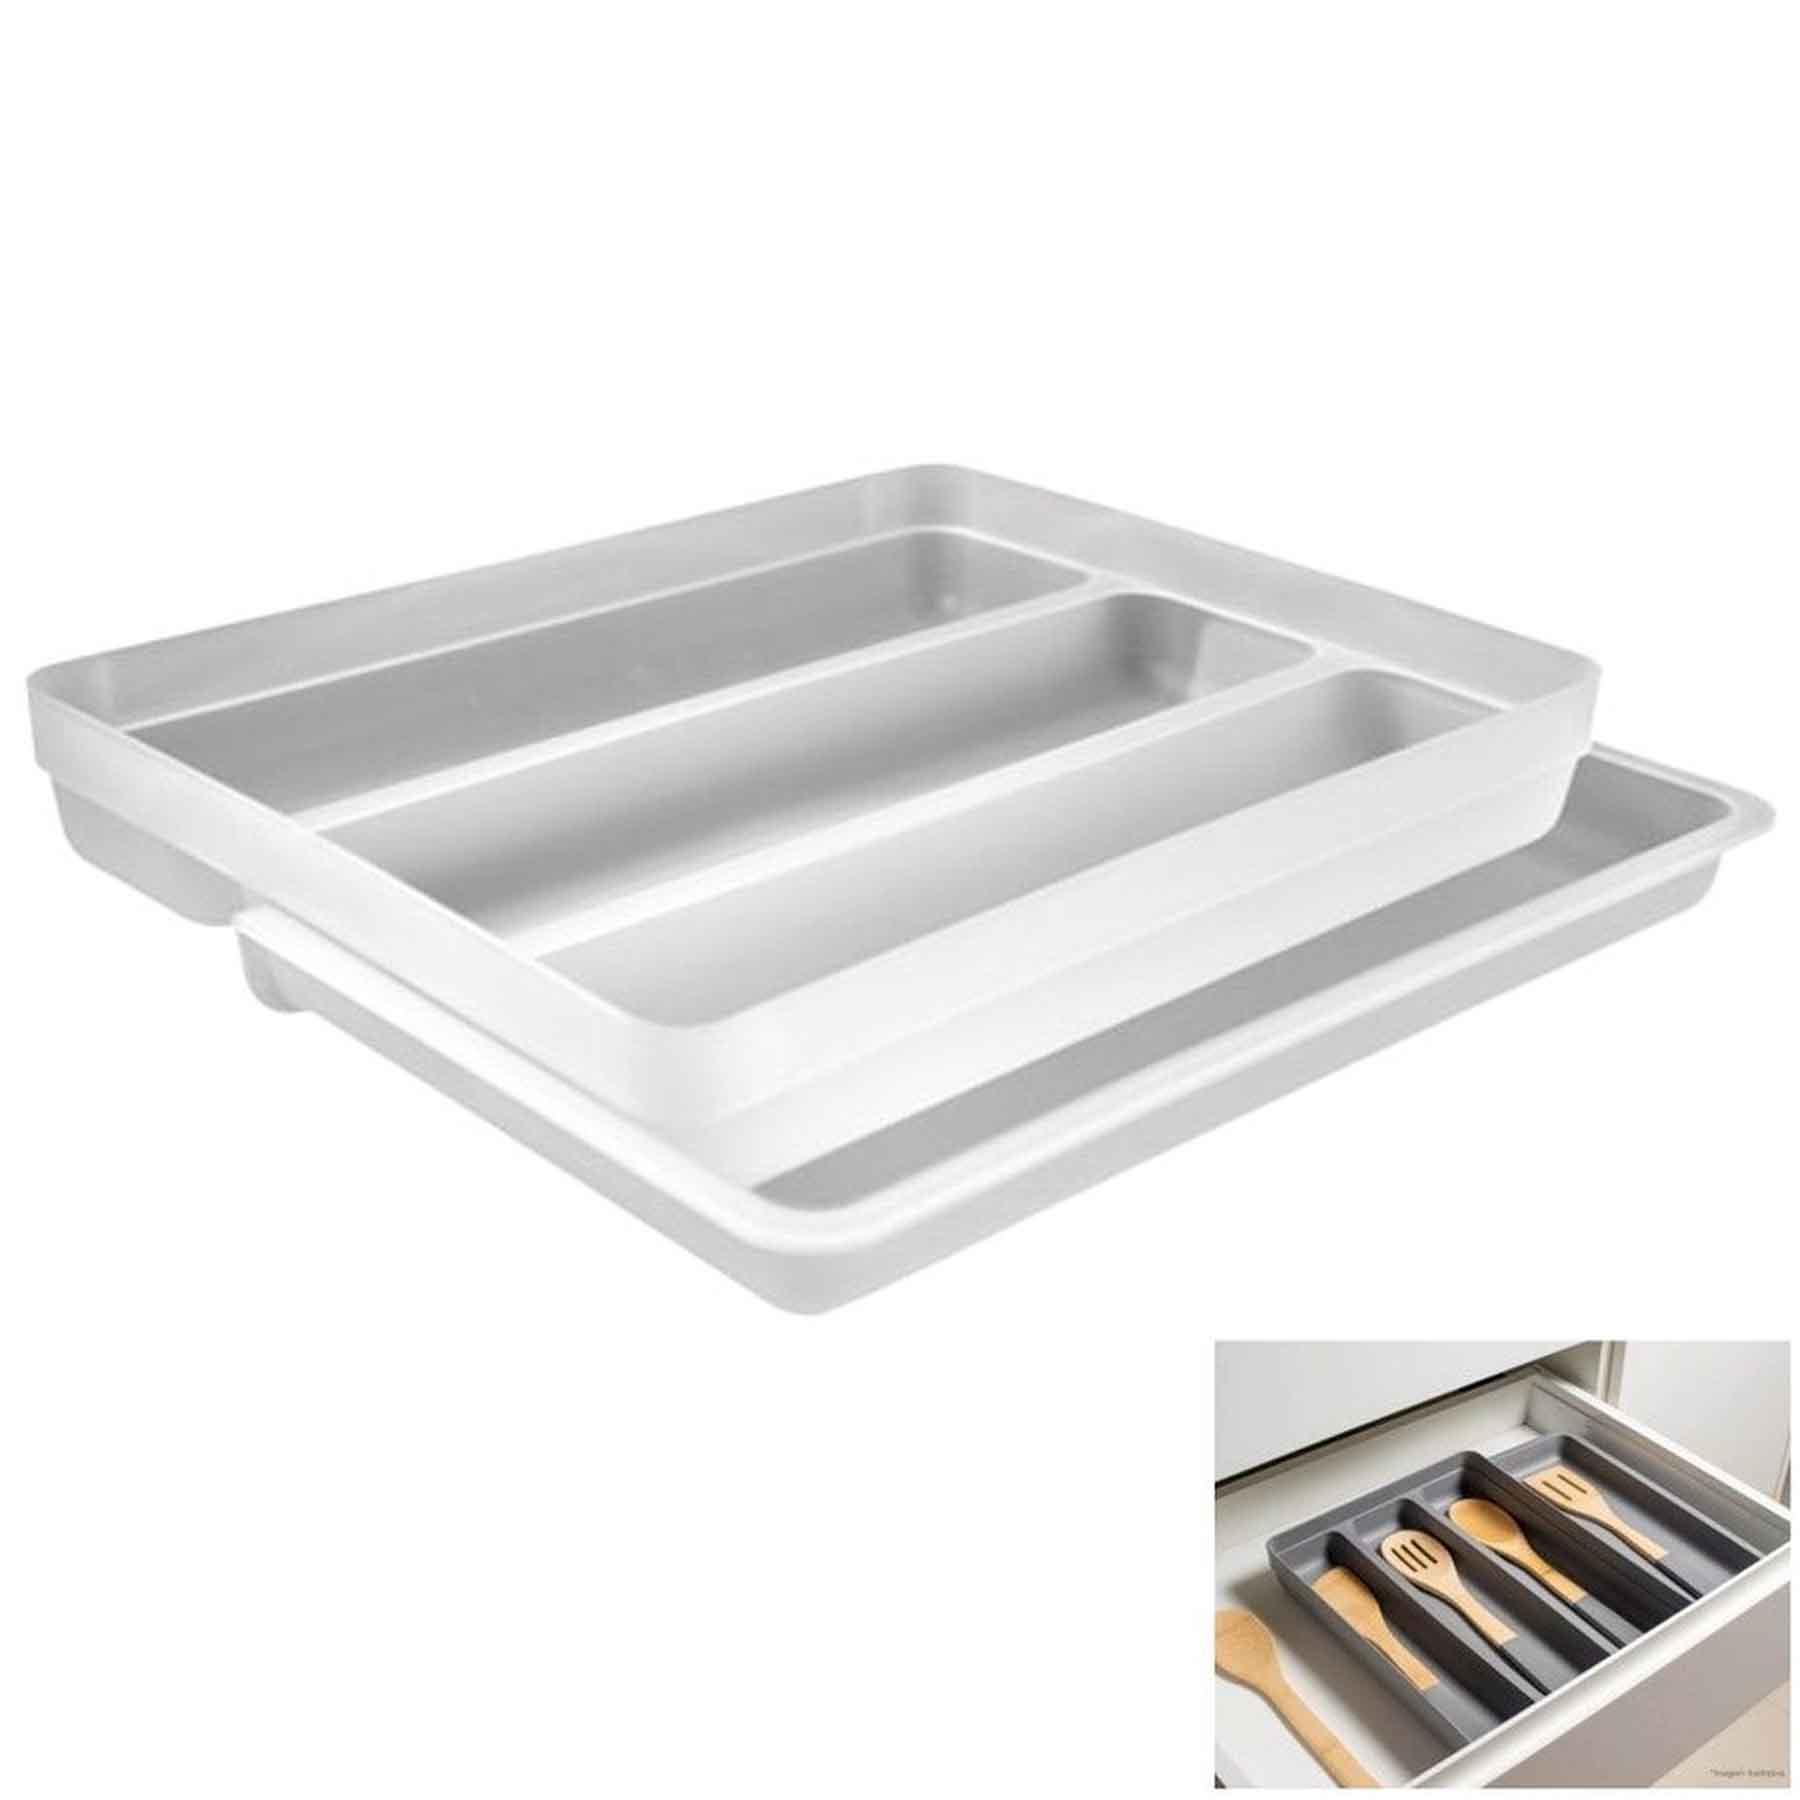 Organizador de Utensílios extensor Branco 36x27,6x5,7 cm